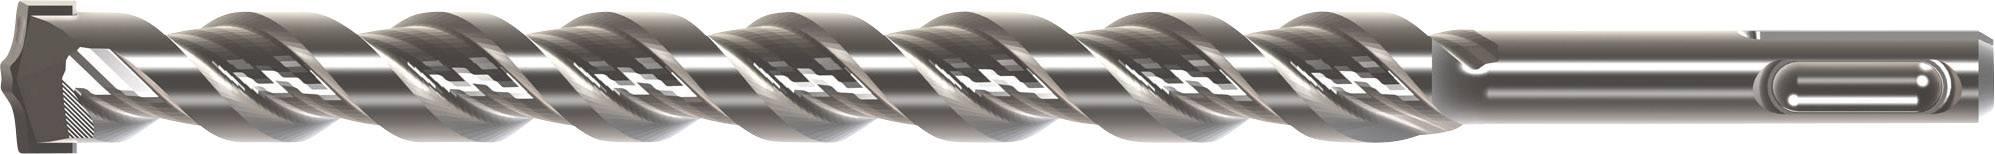 Tvrdý kov kladivový vrták Heller 186896, 18 mm, 300 mm, 1 ks